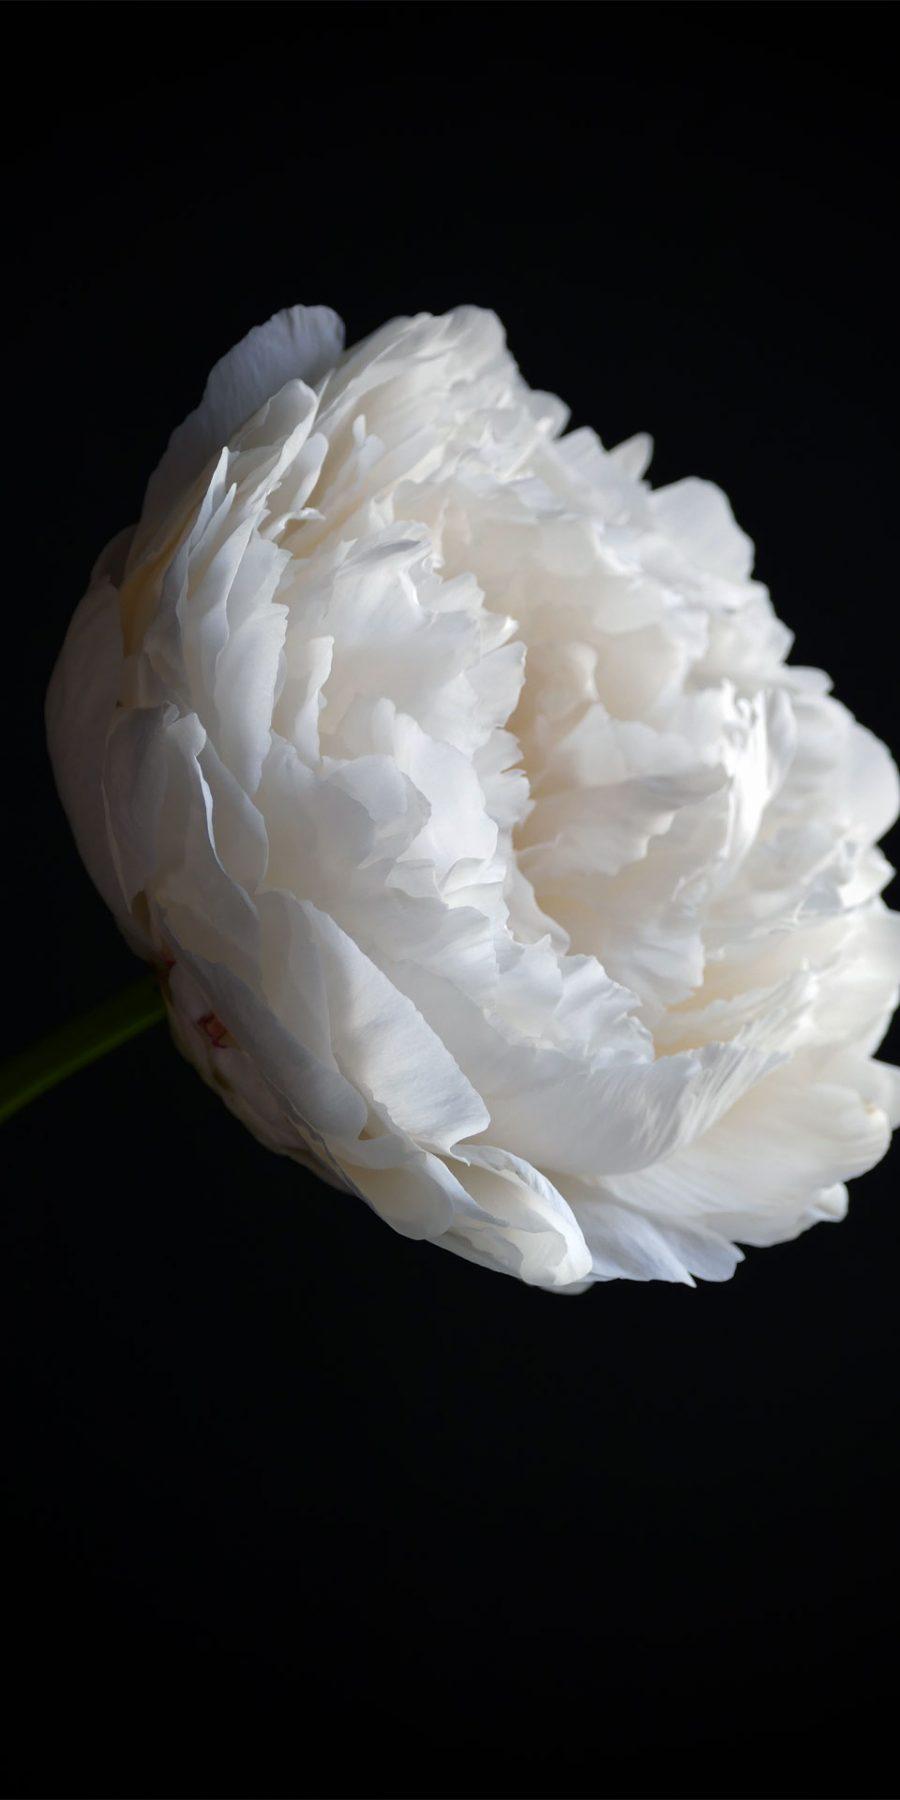 Casa Mia Wald-Michelbach The art of flowers